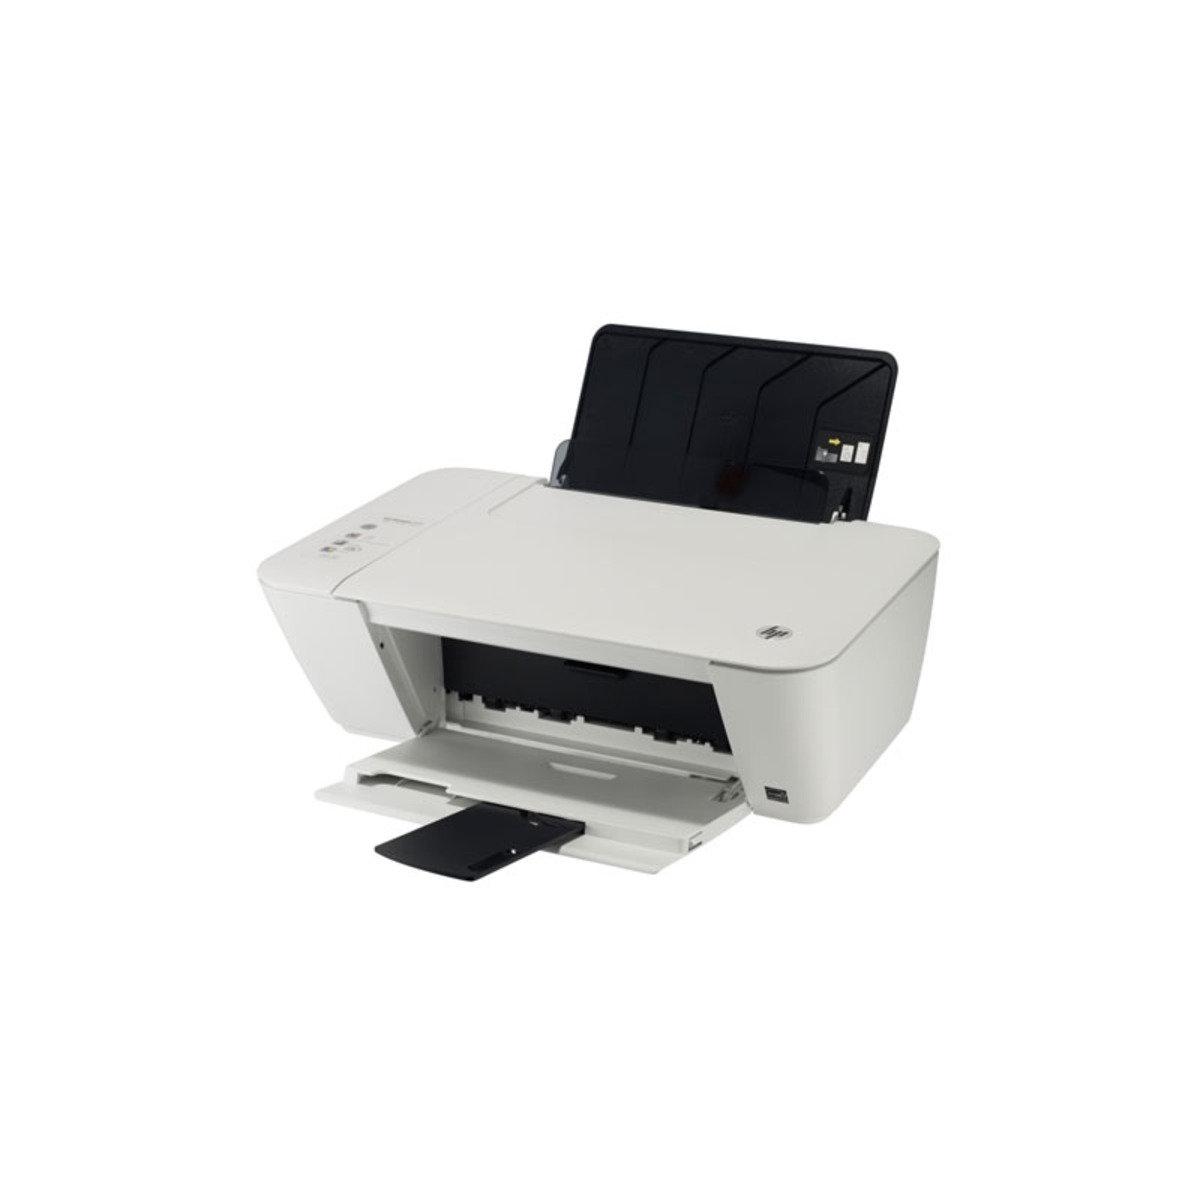 HP Deskjet 多合一打印機 Deskjet 1510